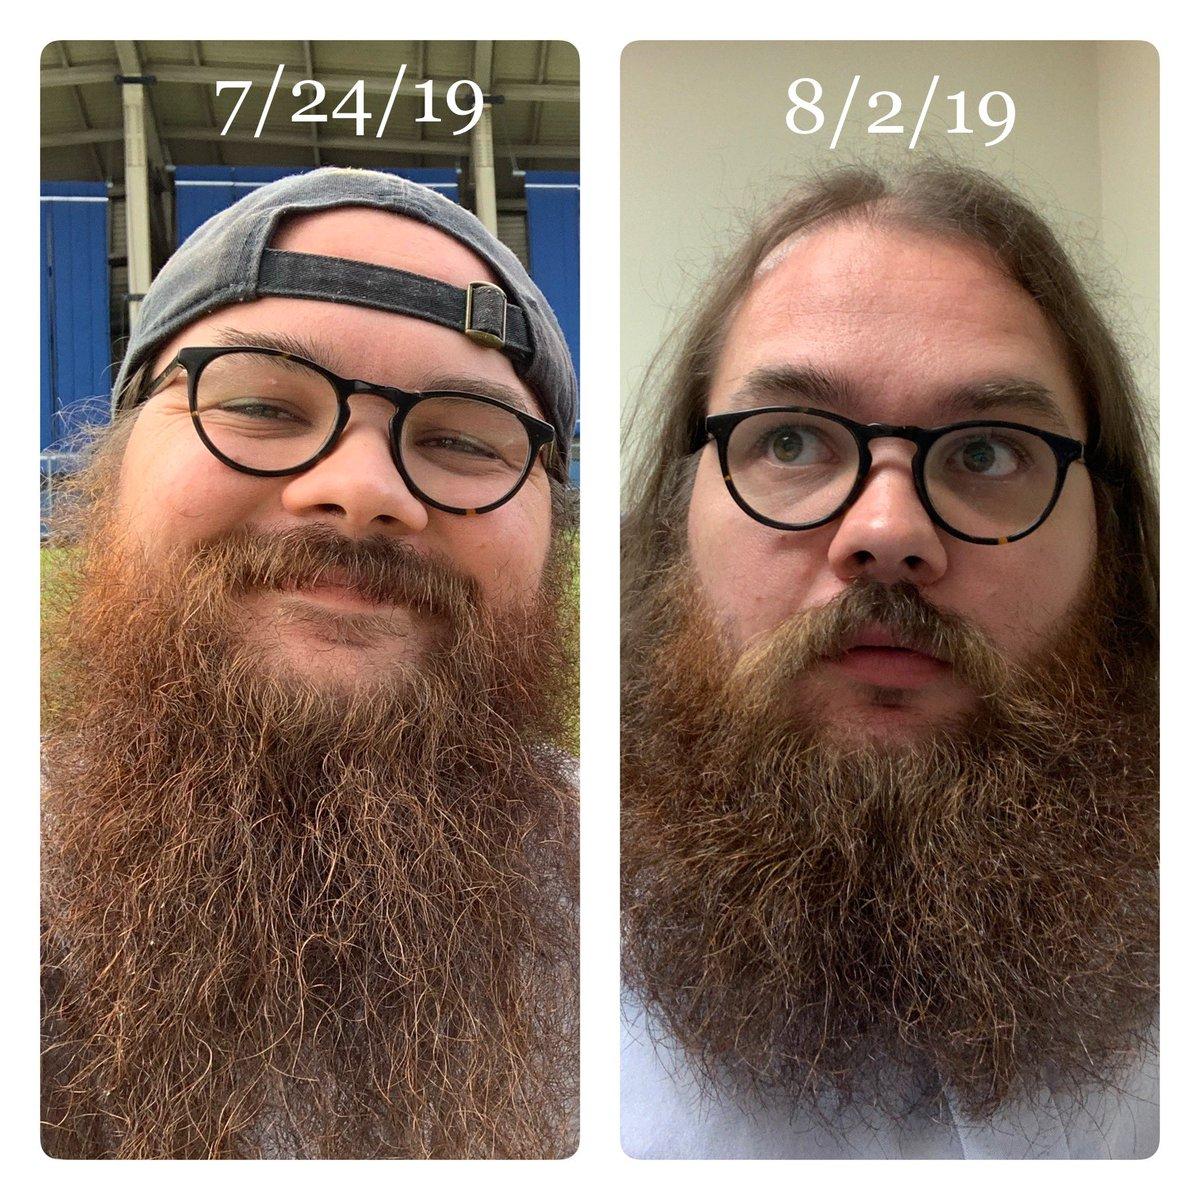 @NickSpagnuolo3 Just got 5-inches cut off, too. Gotta look professional, amiright @ProfSpiker?